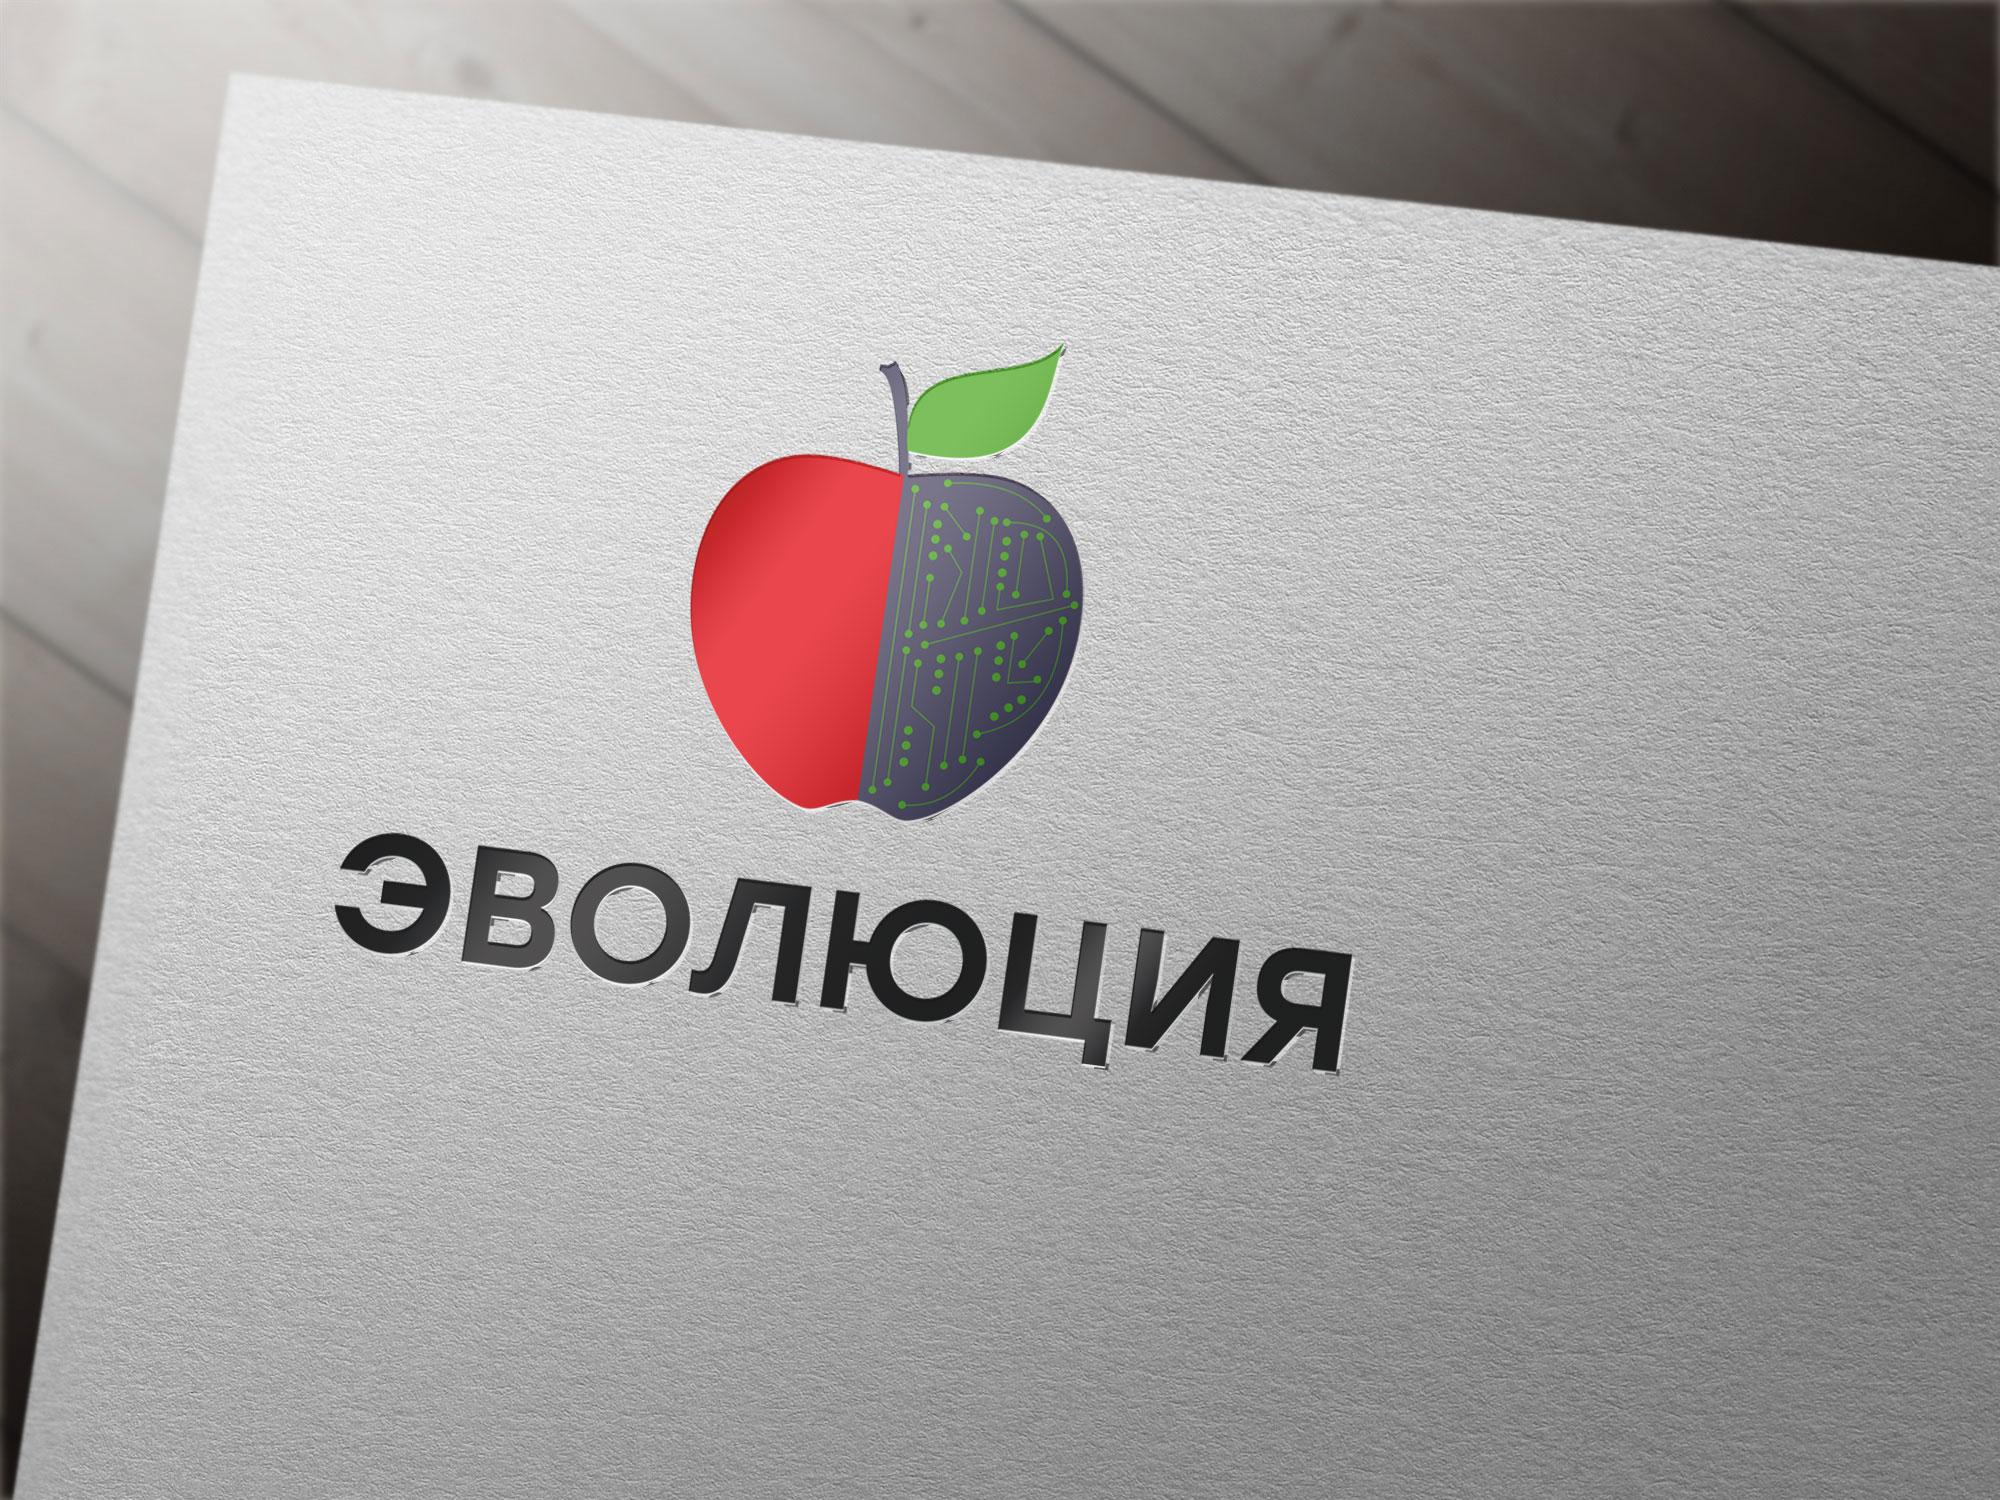 Разработать логотип для Онлайн-школы и сообщества фото f_1155bc1bcd96200f.jpg